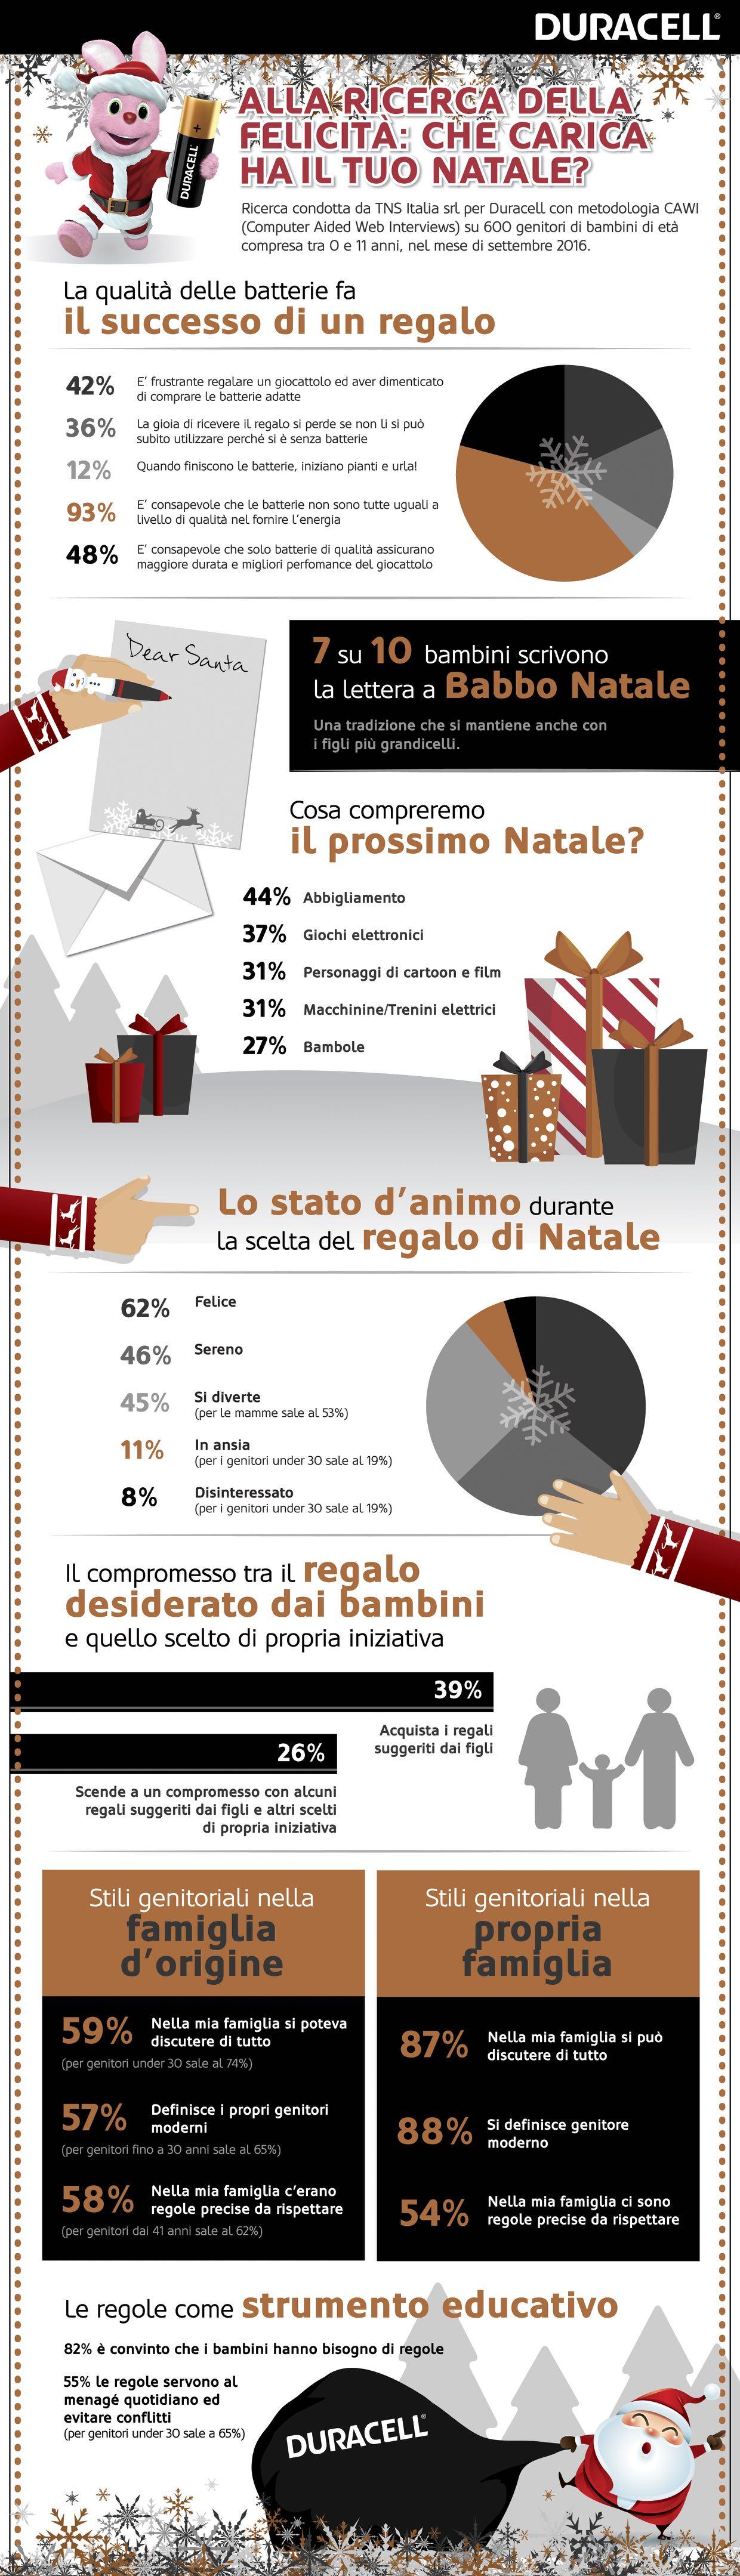 infograficaallaricercadellafelicita